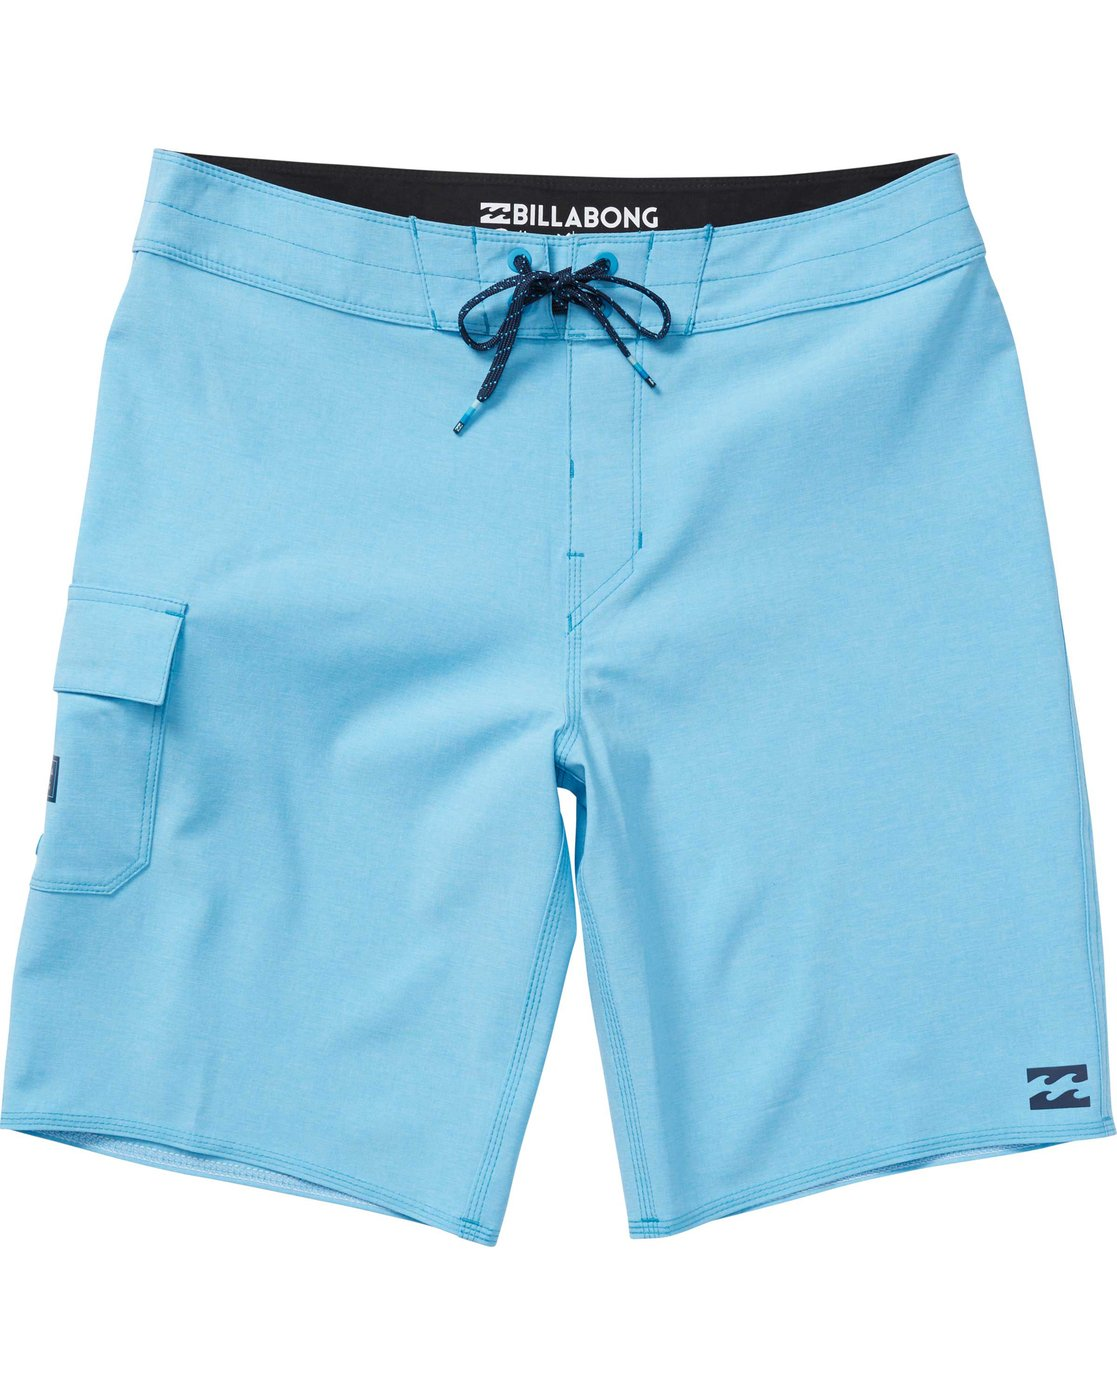 0 All Day X Boardshorts Blue M124NBAL Billabong